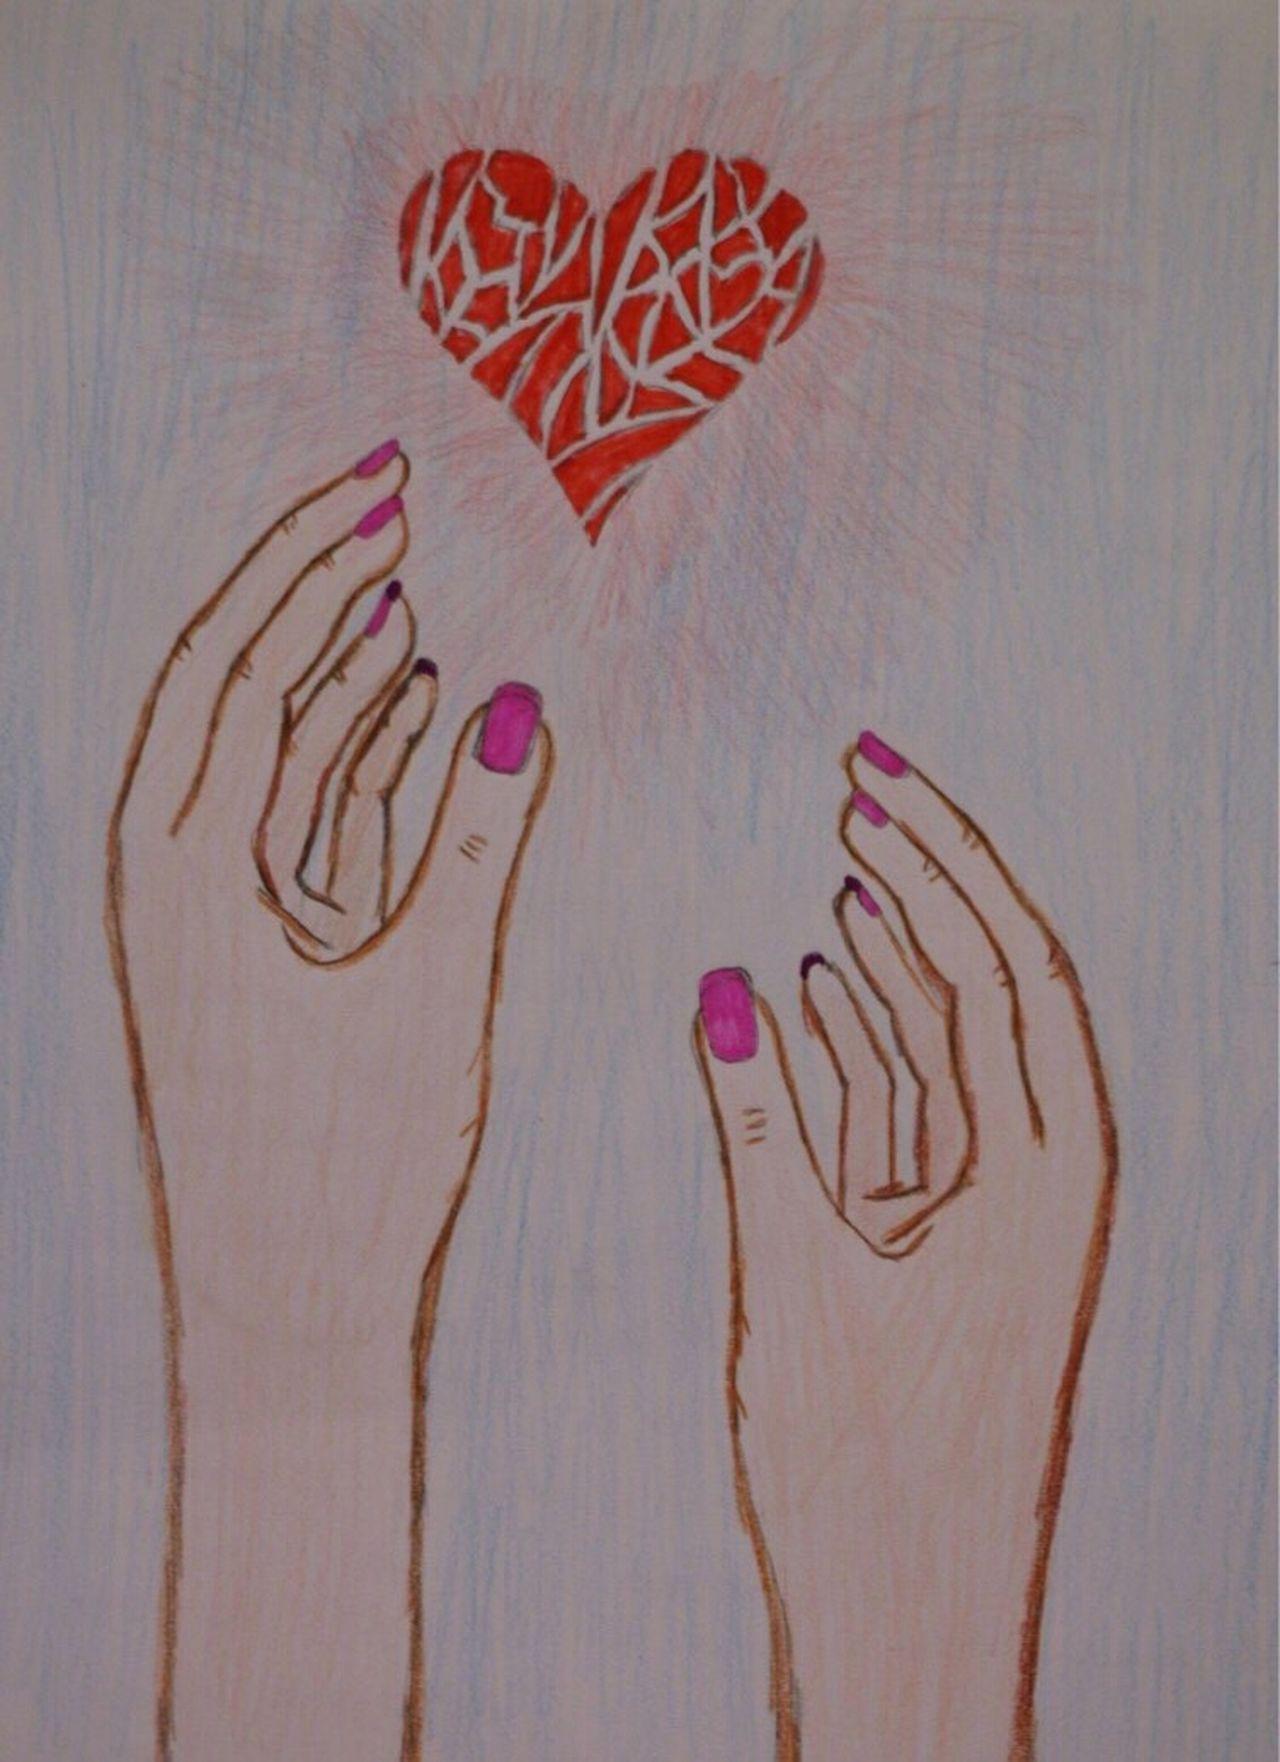 Art And Craft Drawing - Art Product Creativity Heart Shape Drawing - Activity Human Representation Drawn Human Body Part Indoors  ArtWork Close-up Human Hand Day Nikon Draw Drawing Ordinary Love - U2